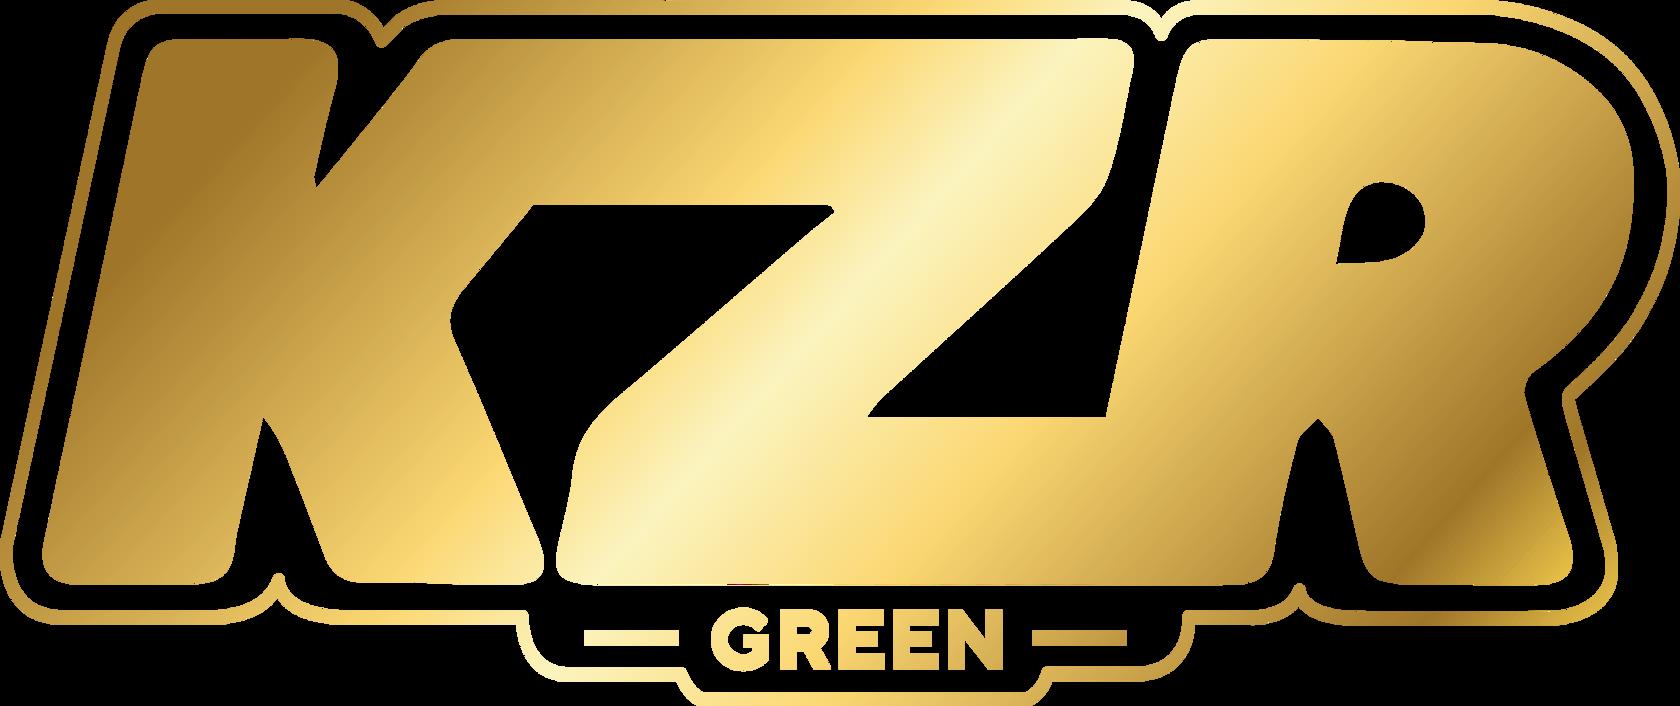 KZR Green